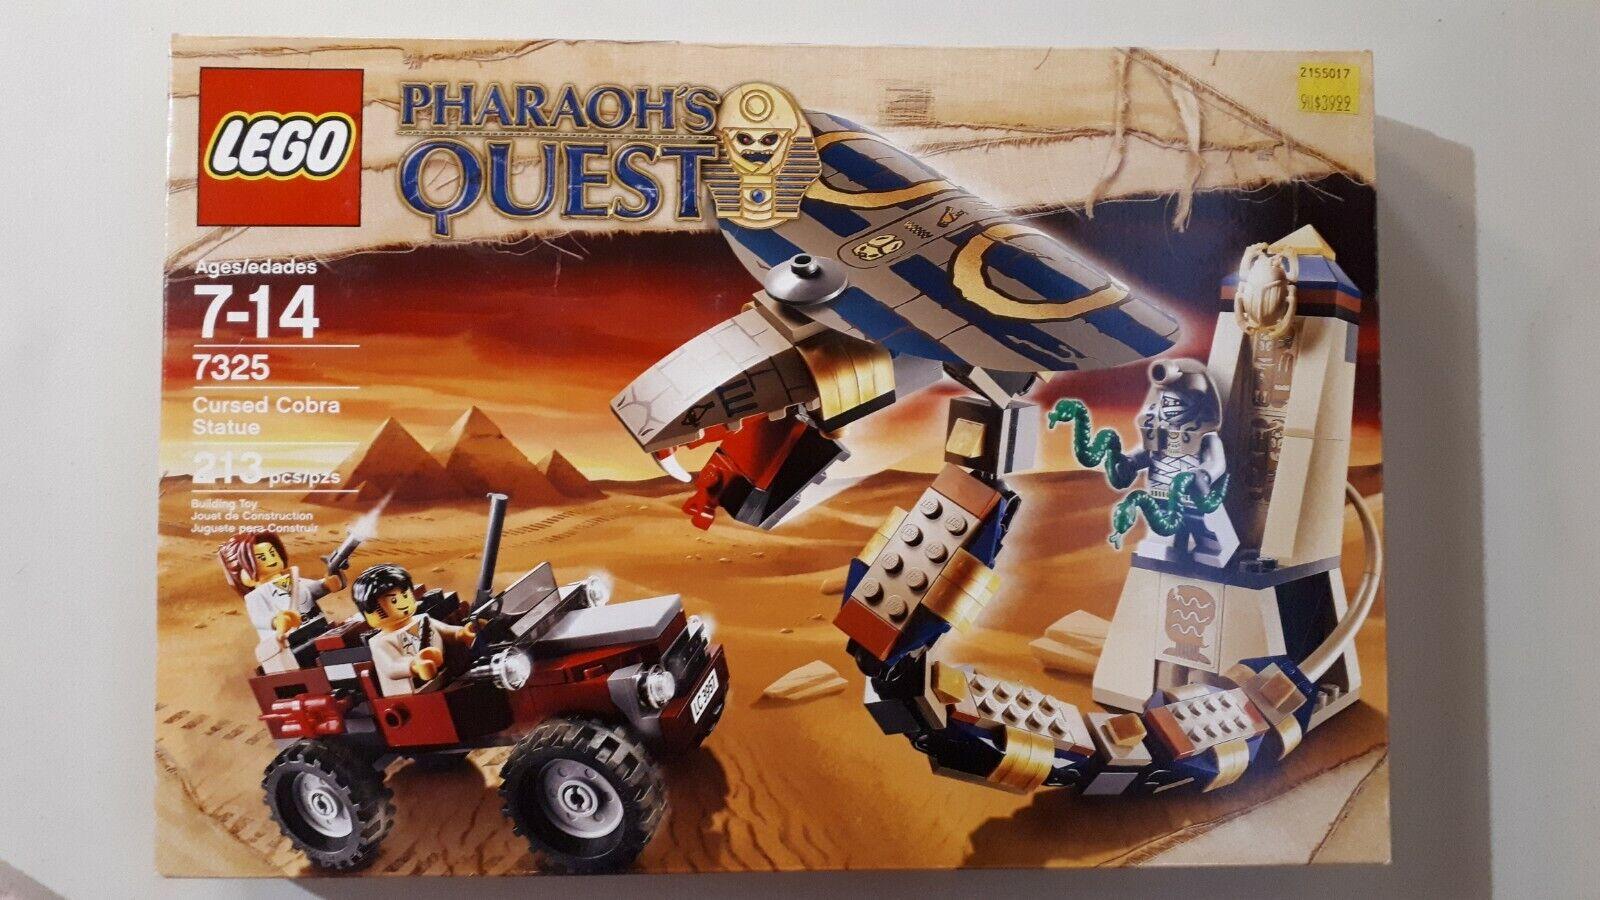 7325 CURSED COBRA STATUE pharaoh's quest LEGO new legos set retired sealed